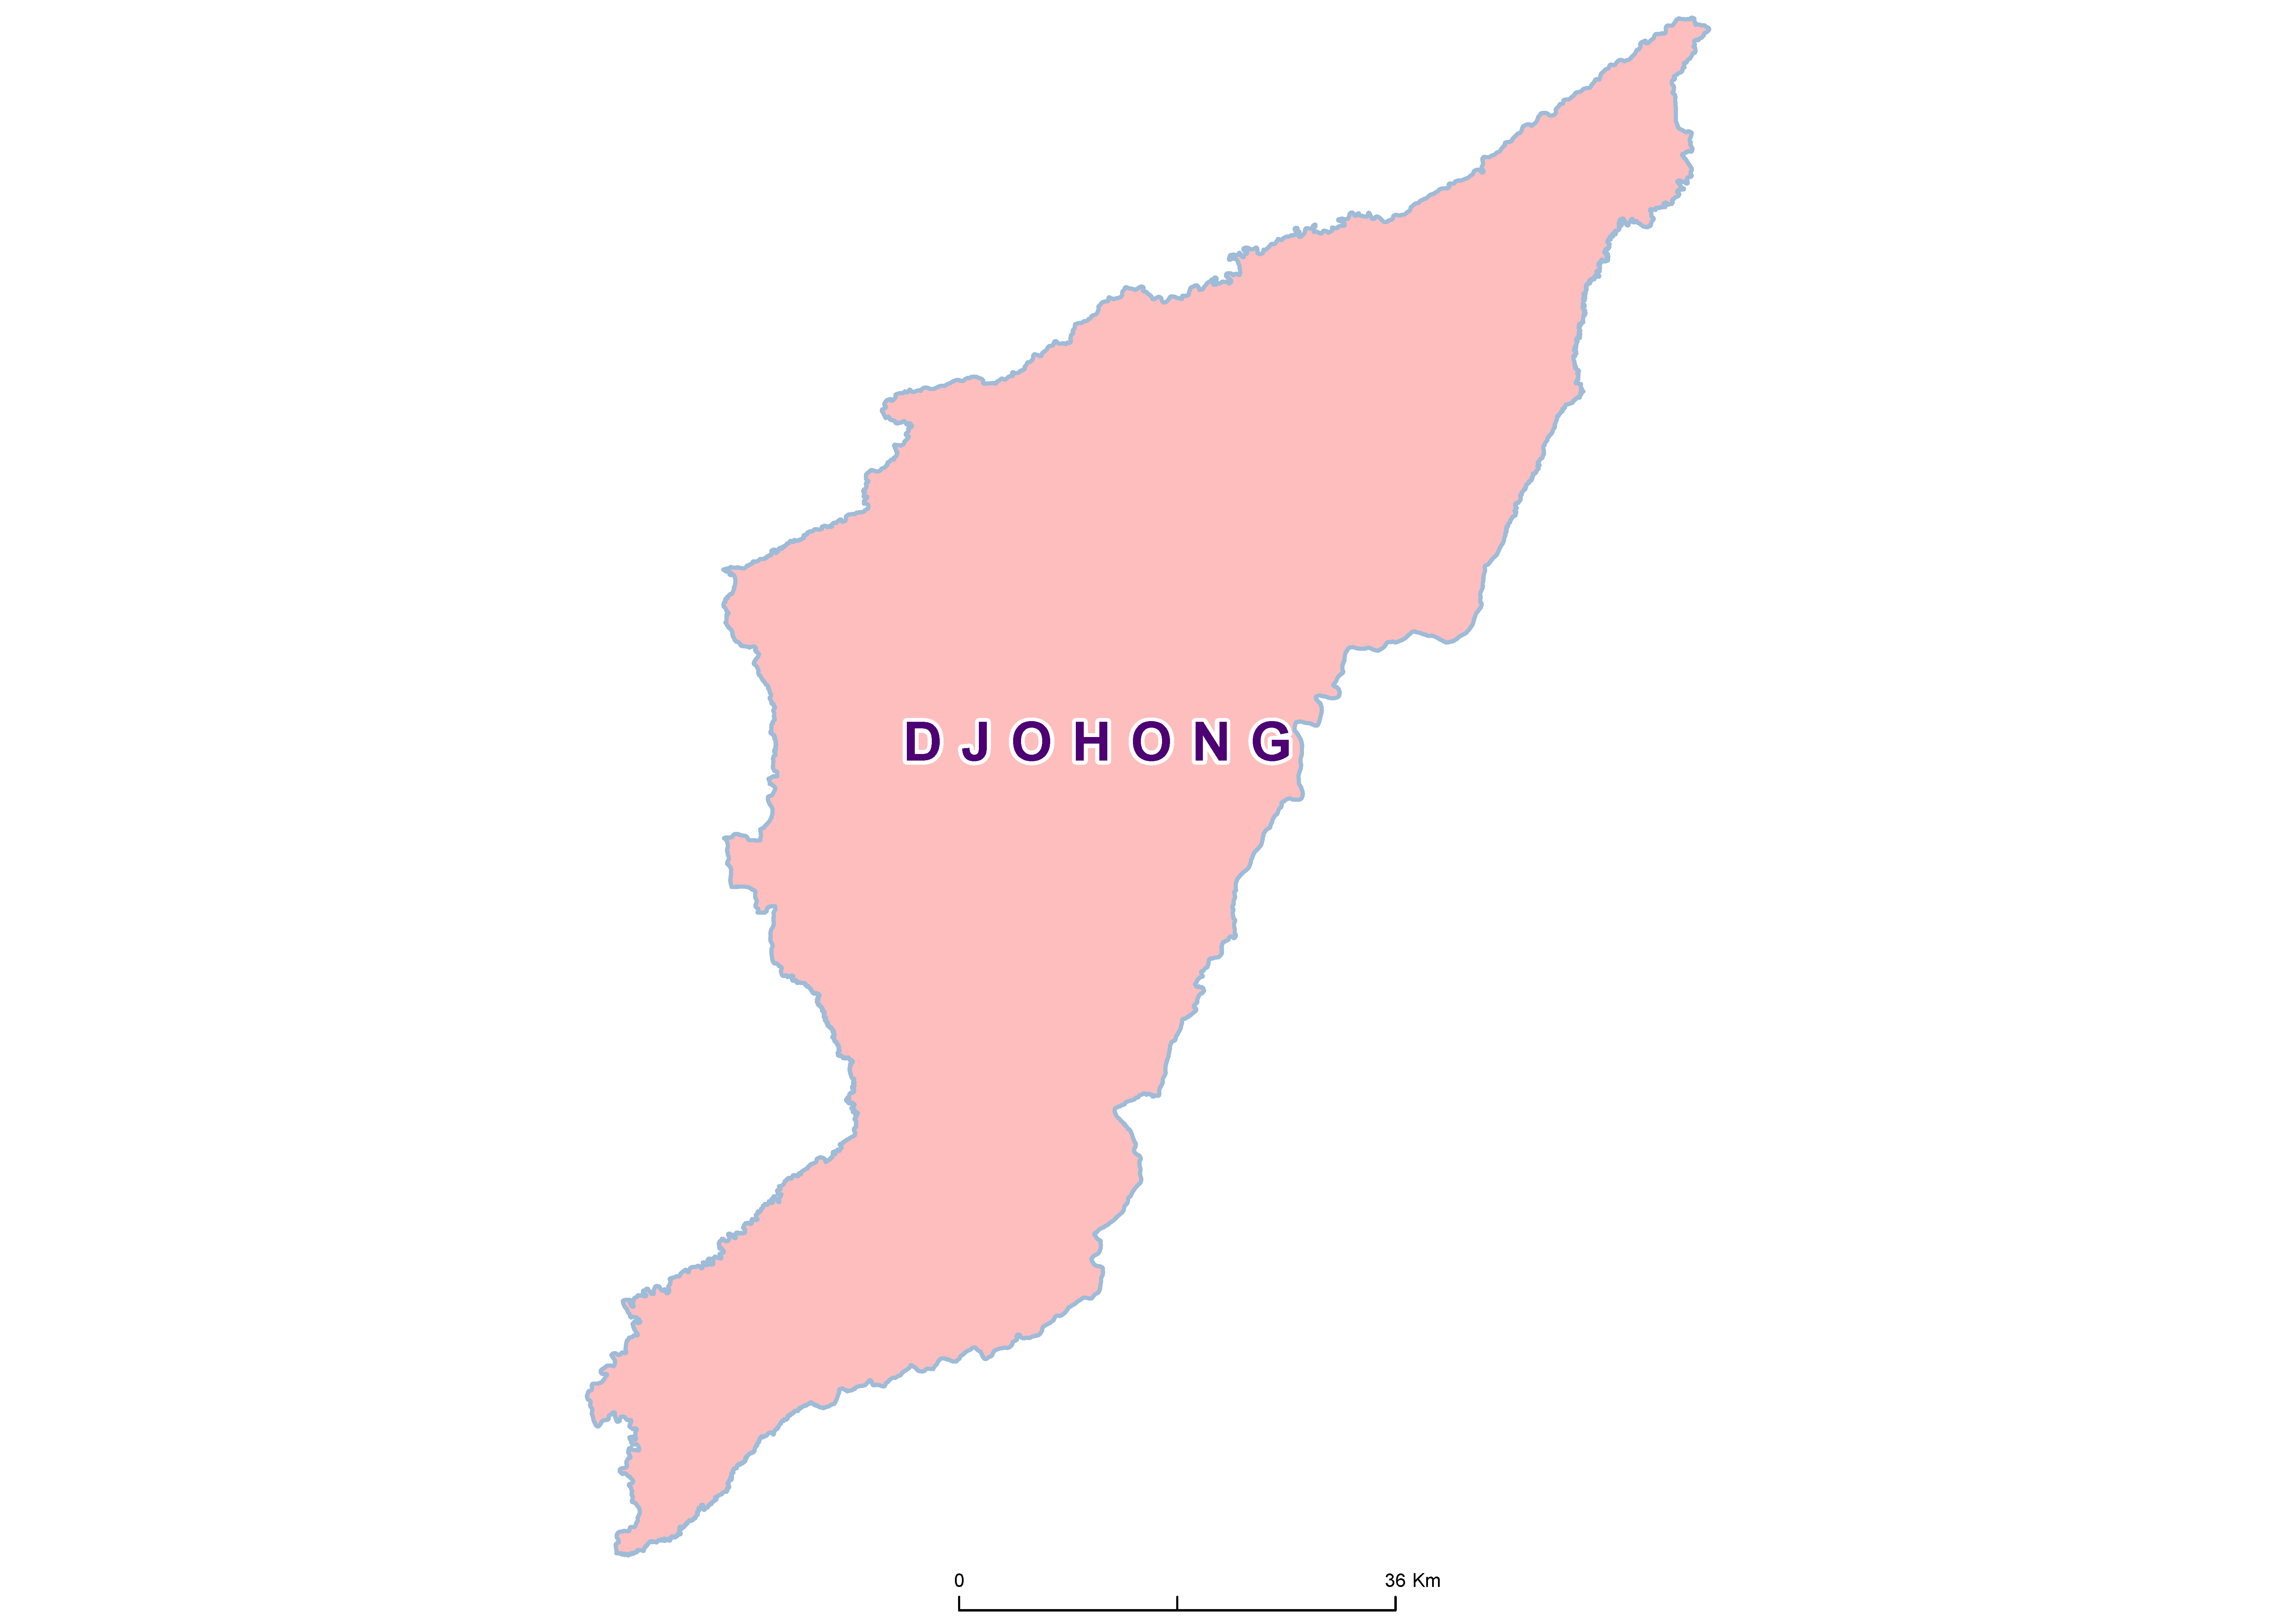 Djohong Mean STH 20100001